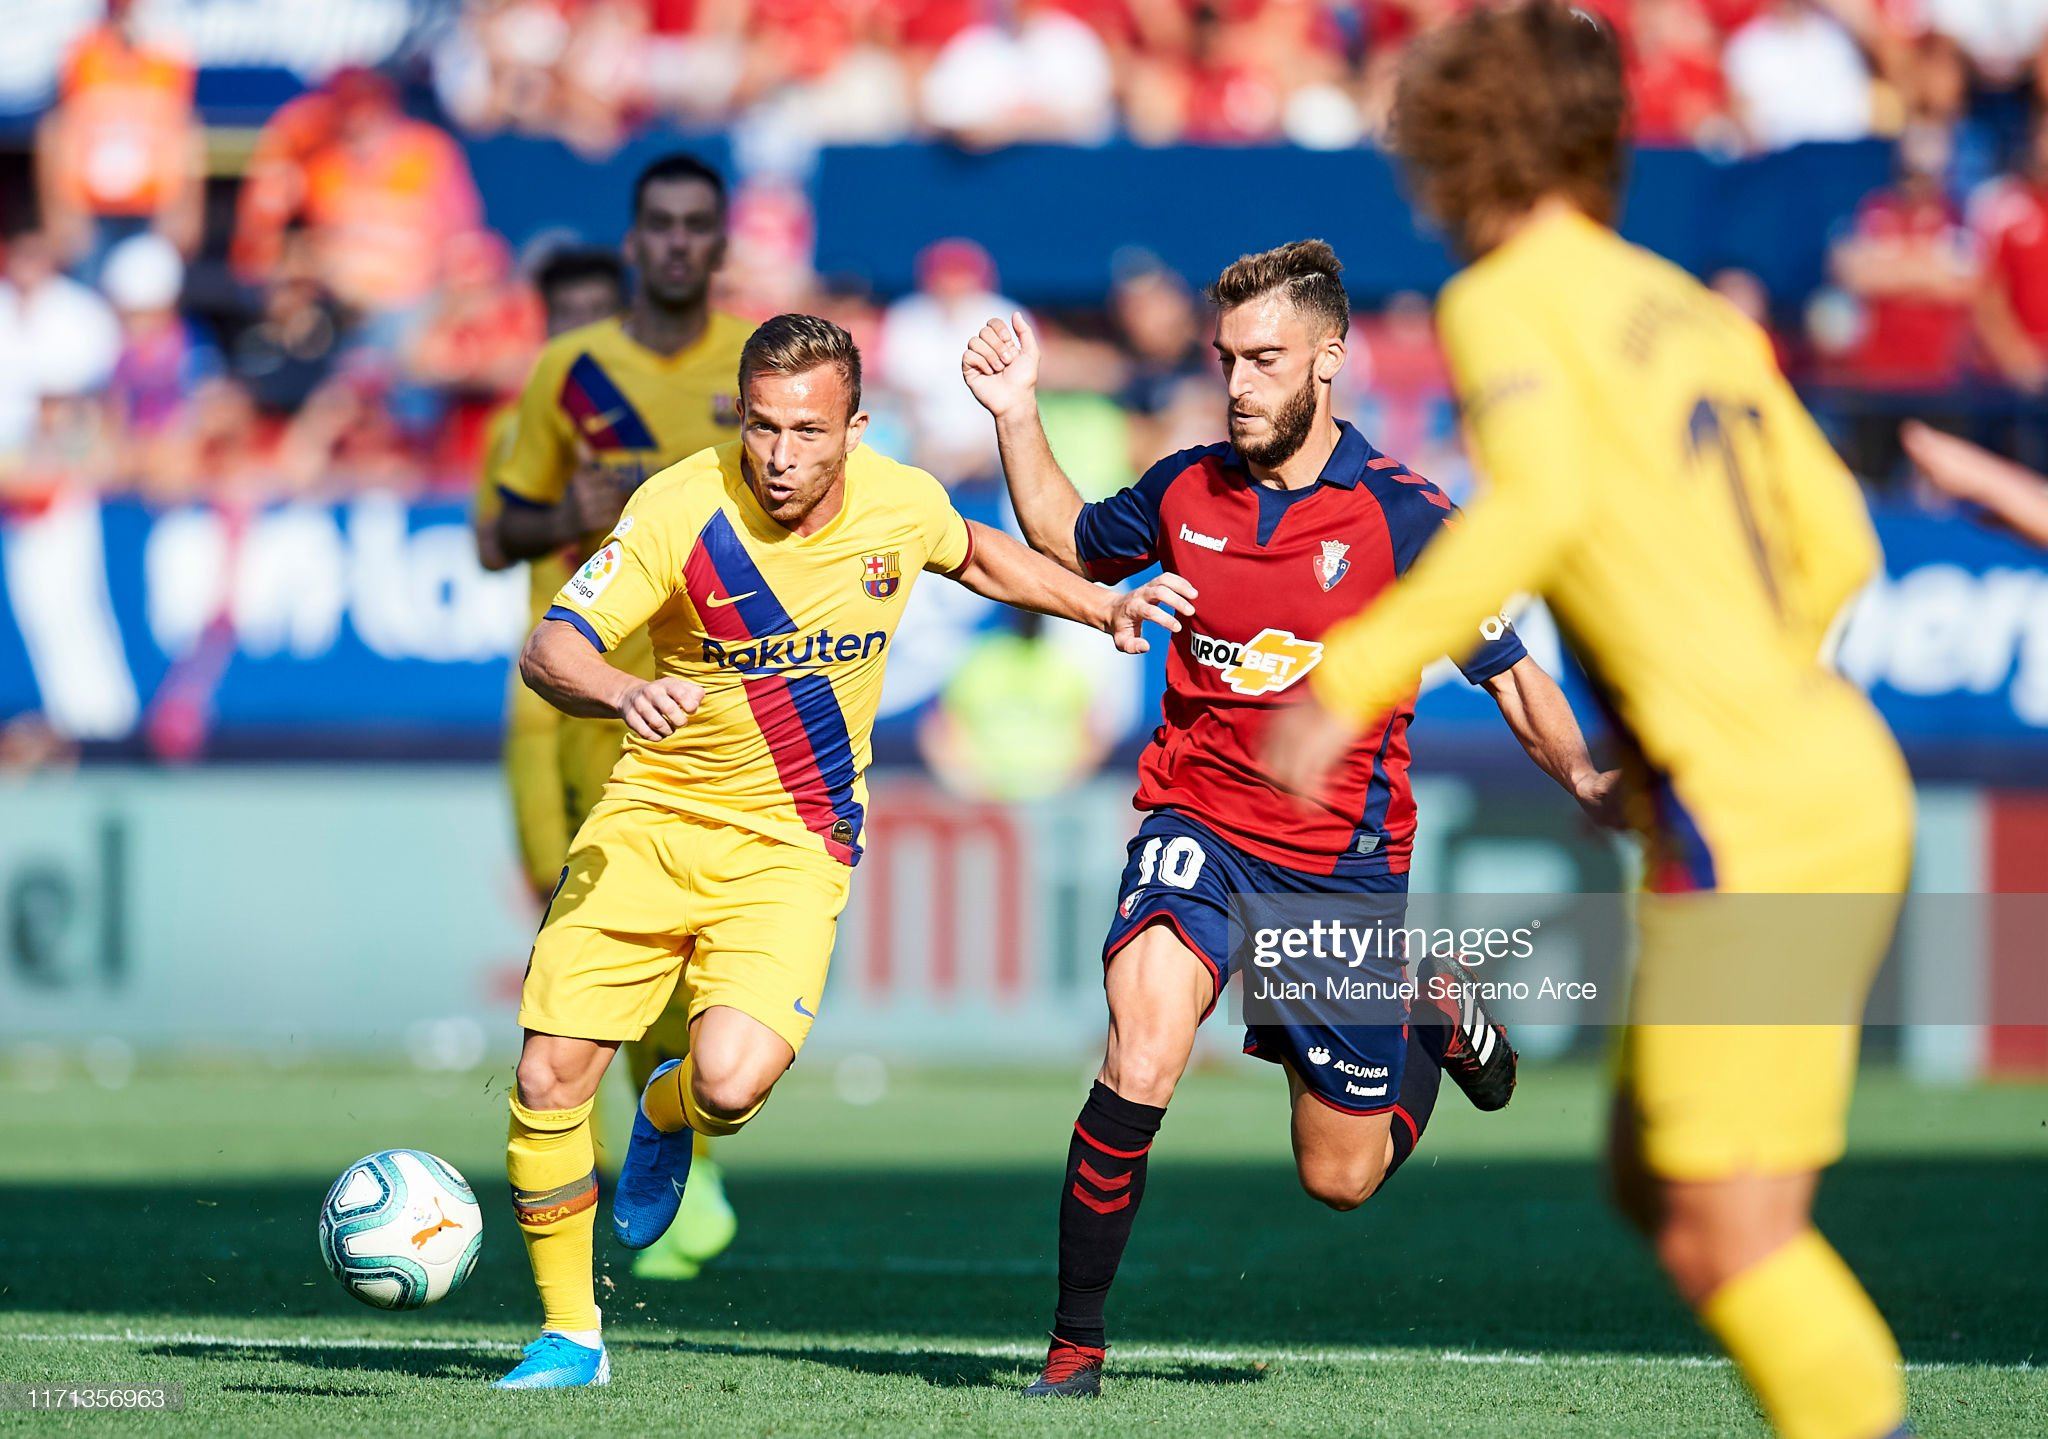 صور مباراة : أوساسونا - برشلونة 2-2 ( 31-08-2019 )  Roberto-torres-of-ca-osasuna-competes-for-the-ball-with-arthur-melo-picture-id1171356963?s=2048x2048